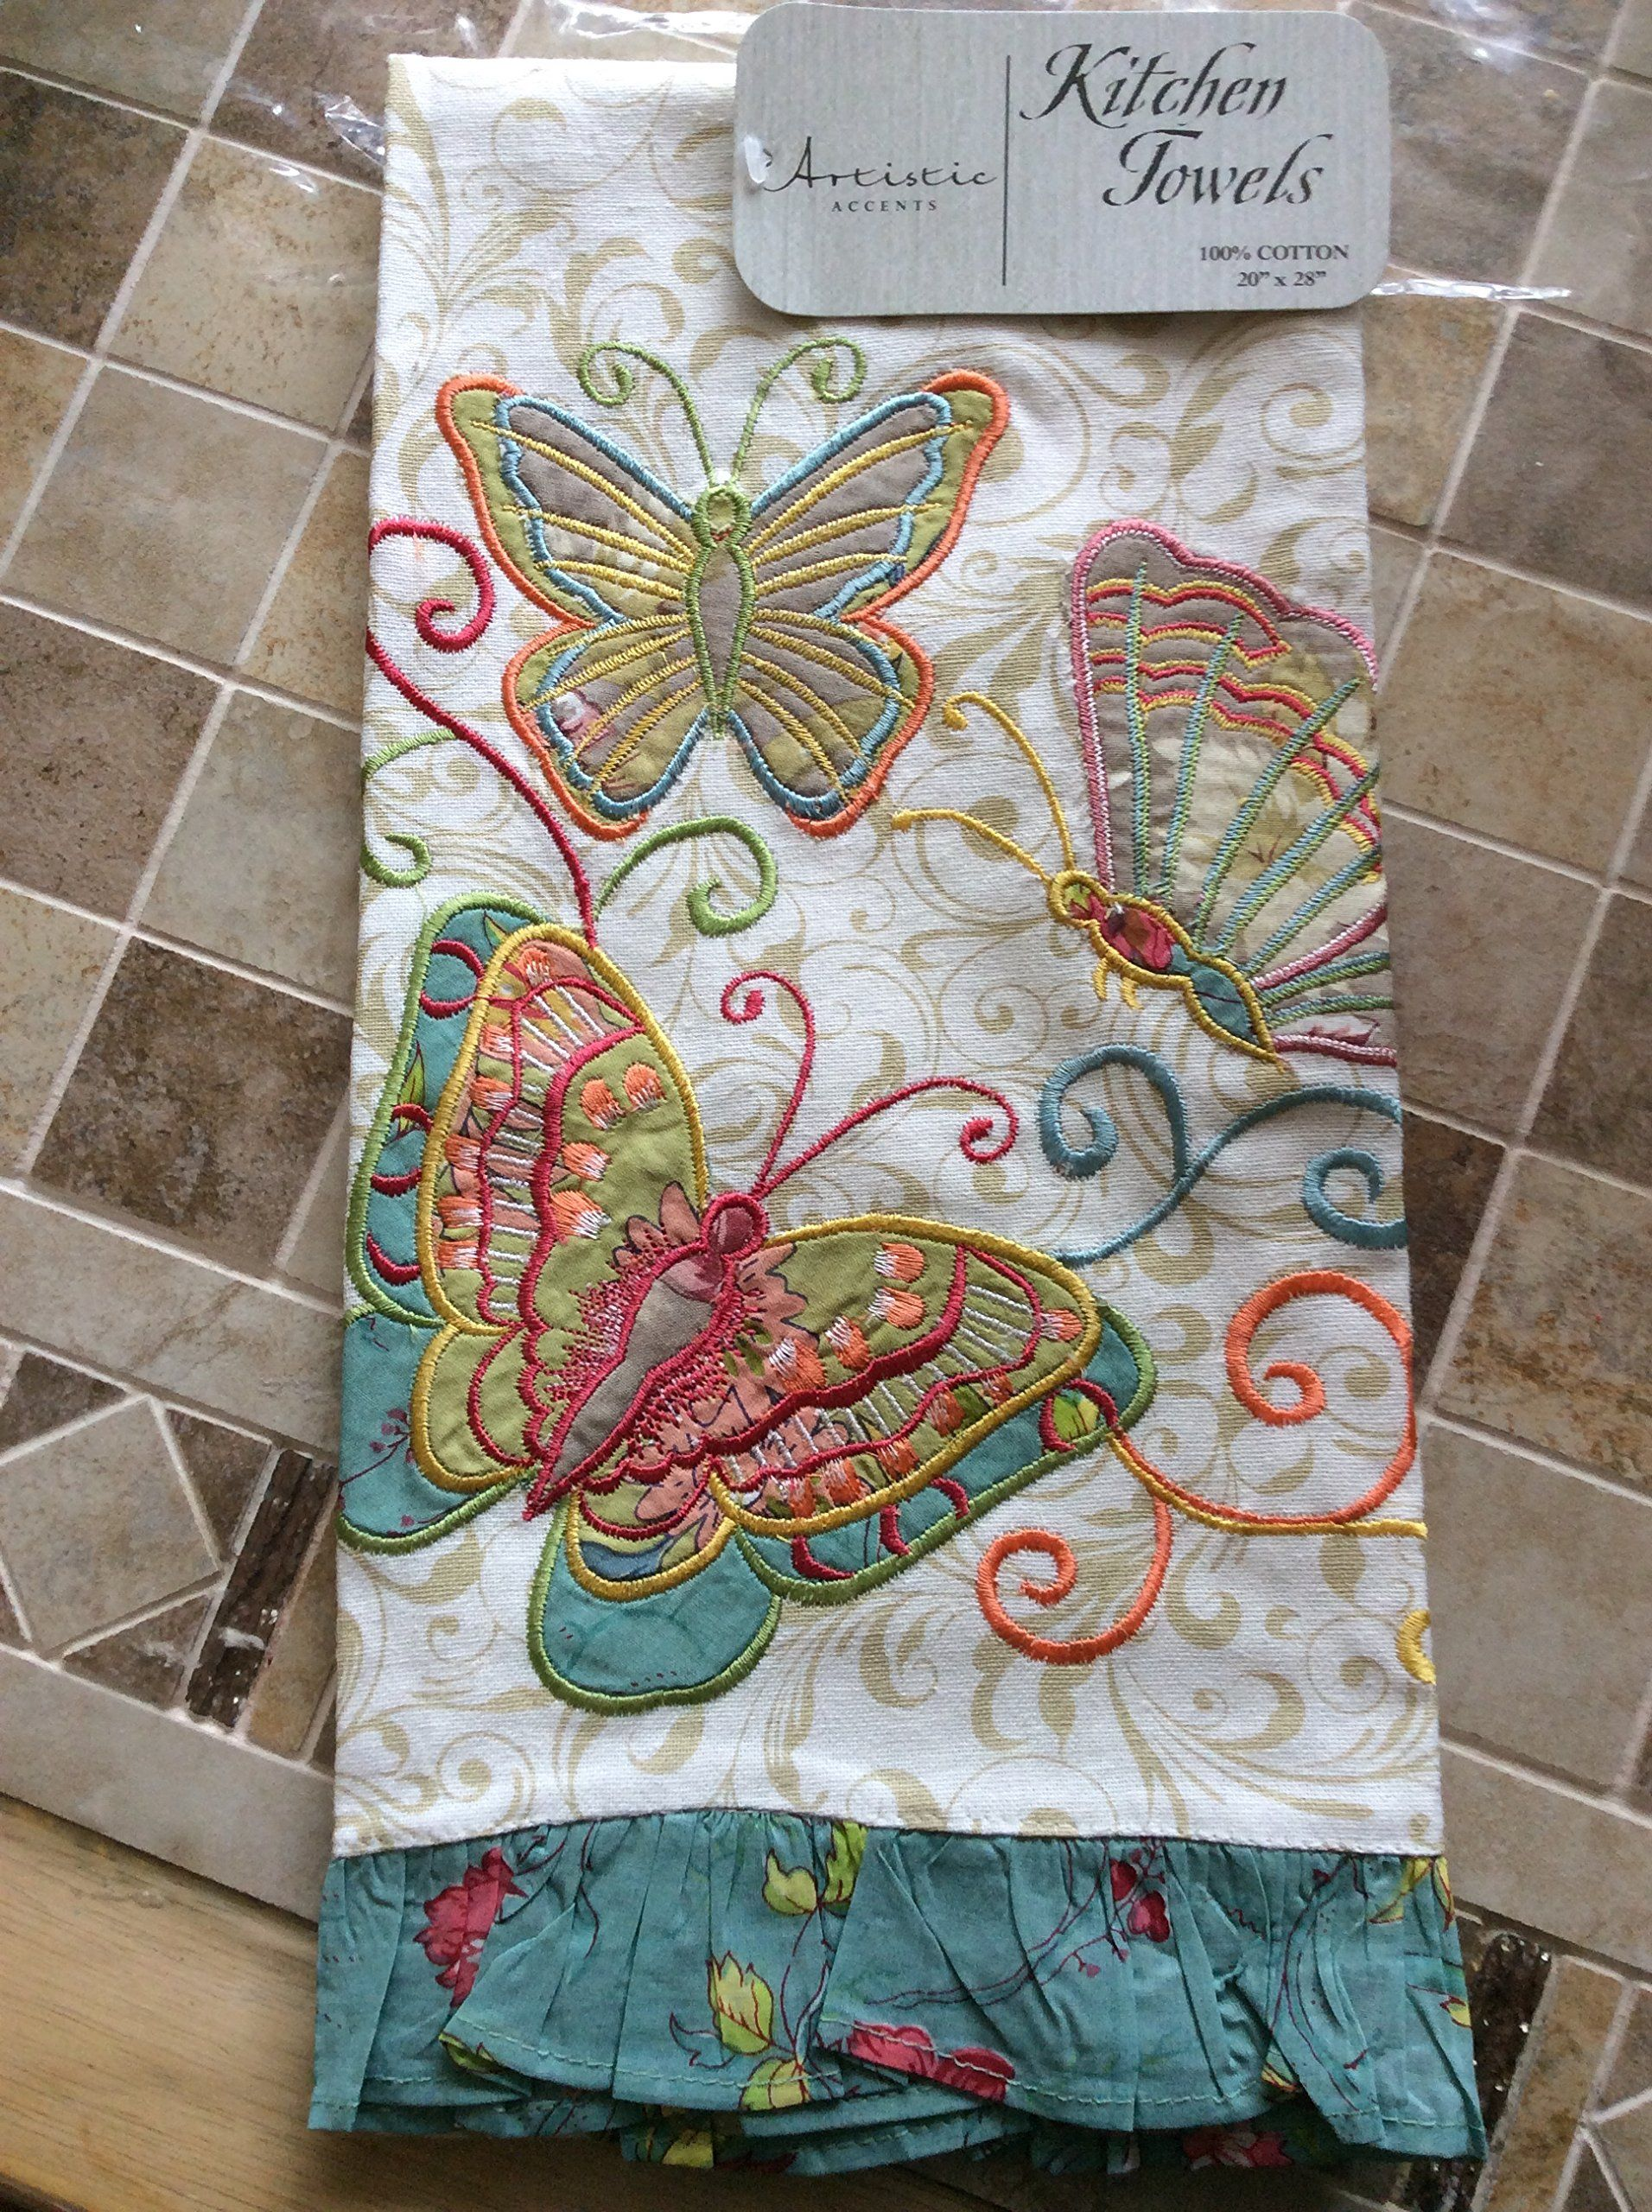 Beau Amazon.com   Artistic Accents Beautiful Butterflies Kitchen Towels